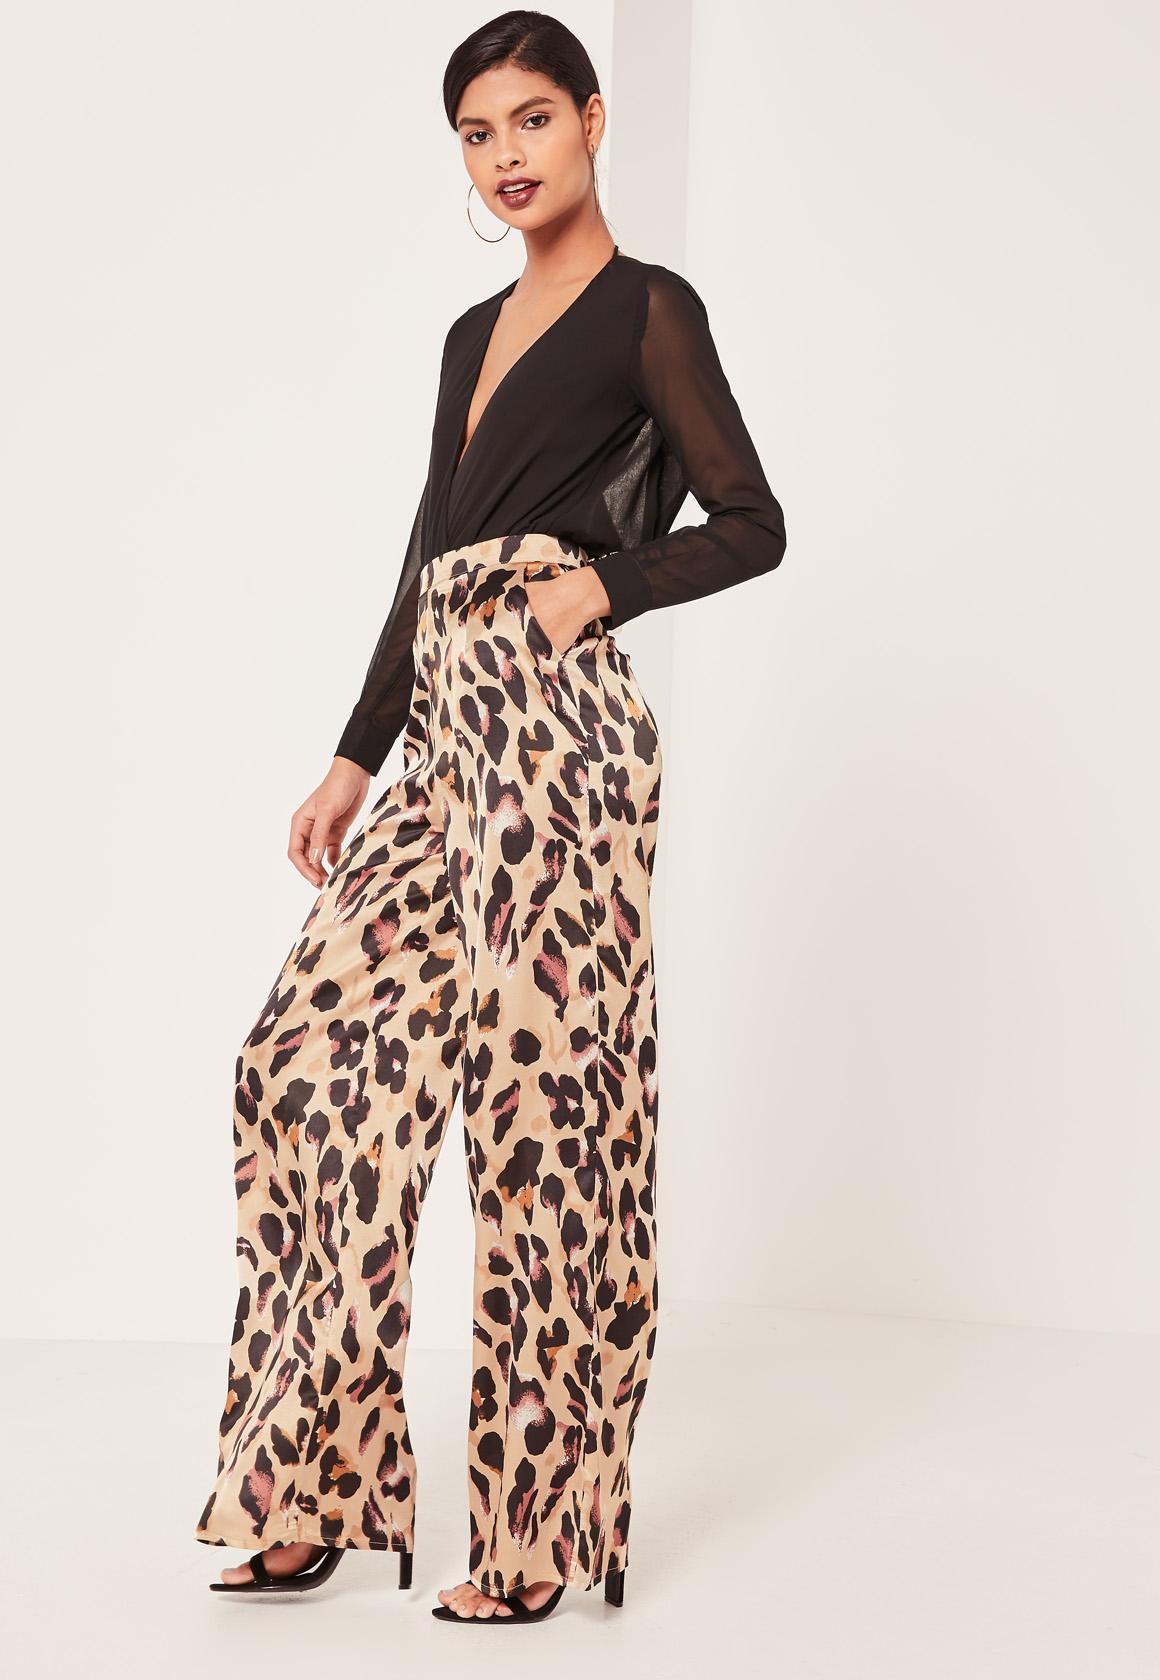 Missguided Printed Wide Leg Trousers Sale Huge Surprise HOpNOG9